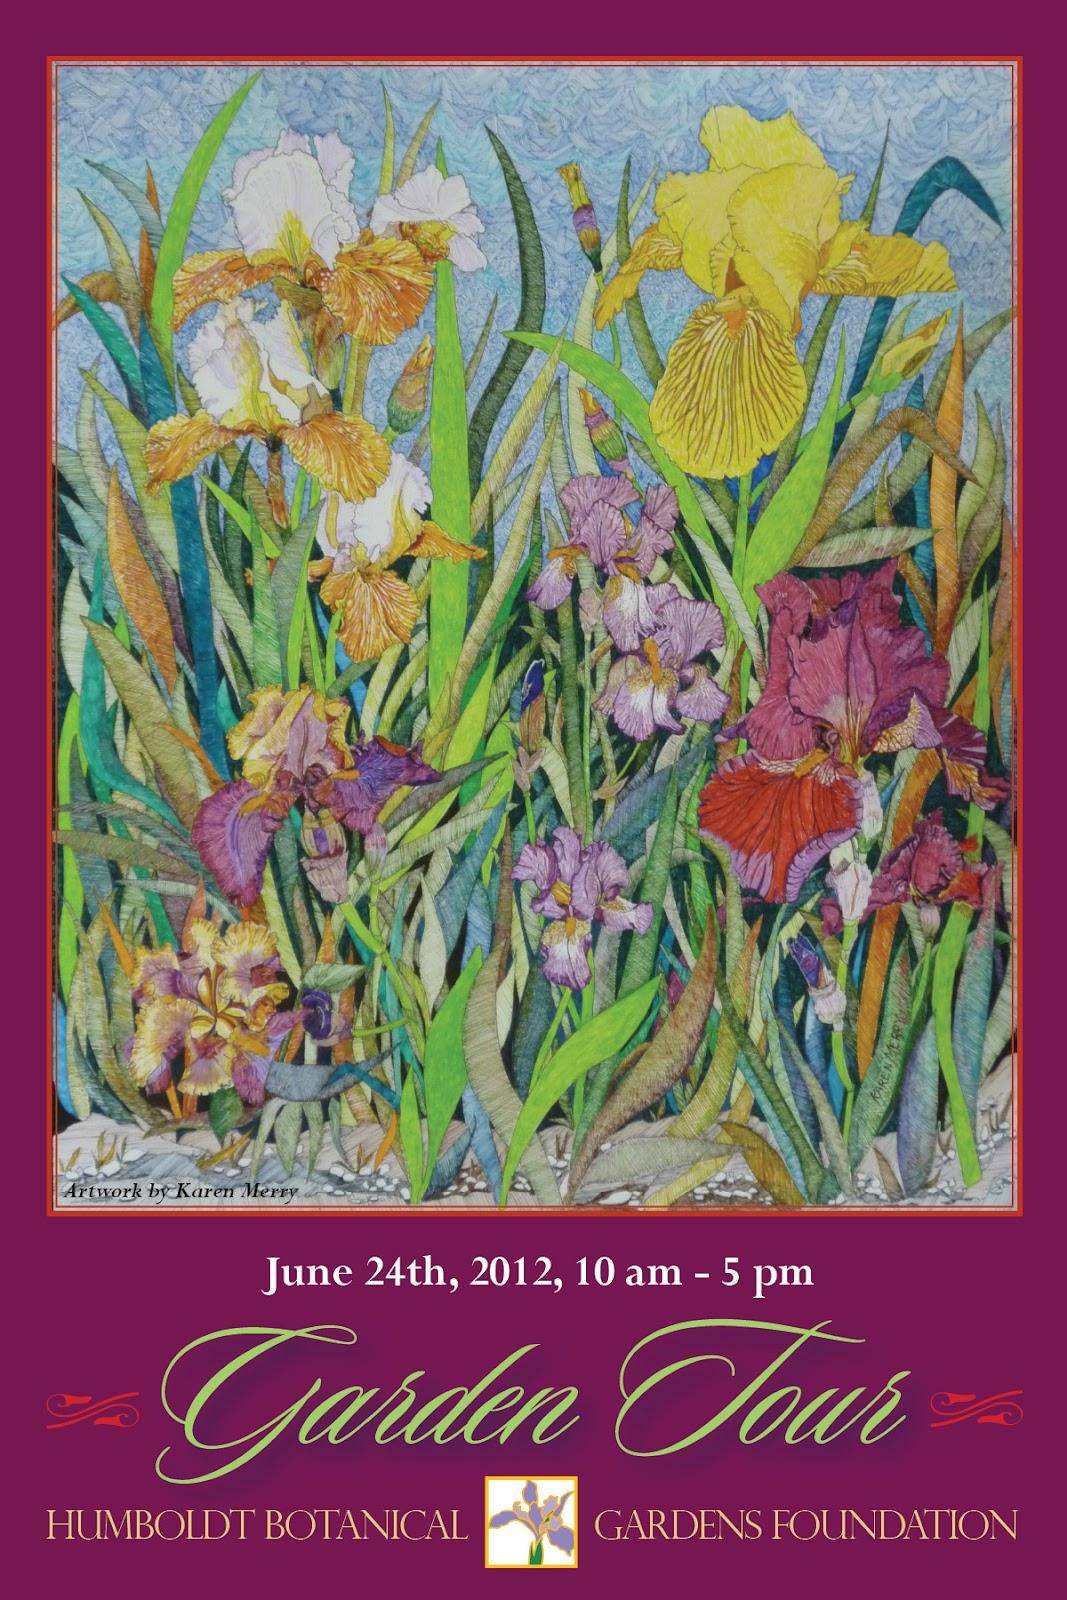 Humbot Garden Tour This Sunday June 24th